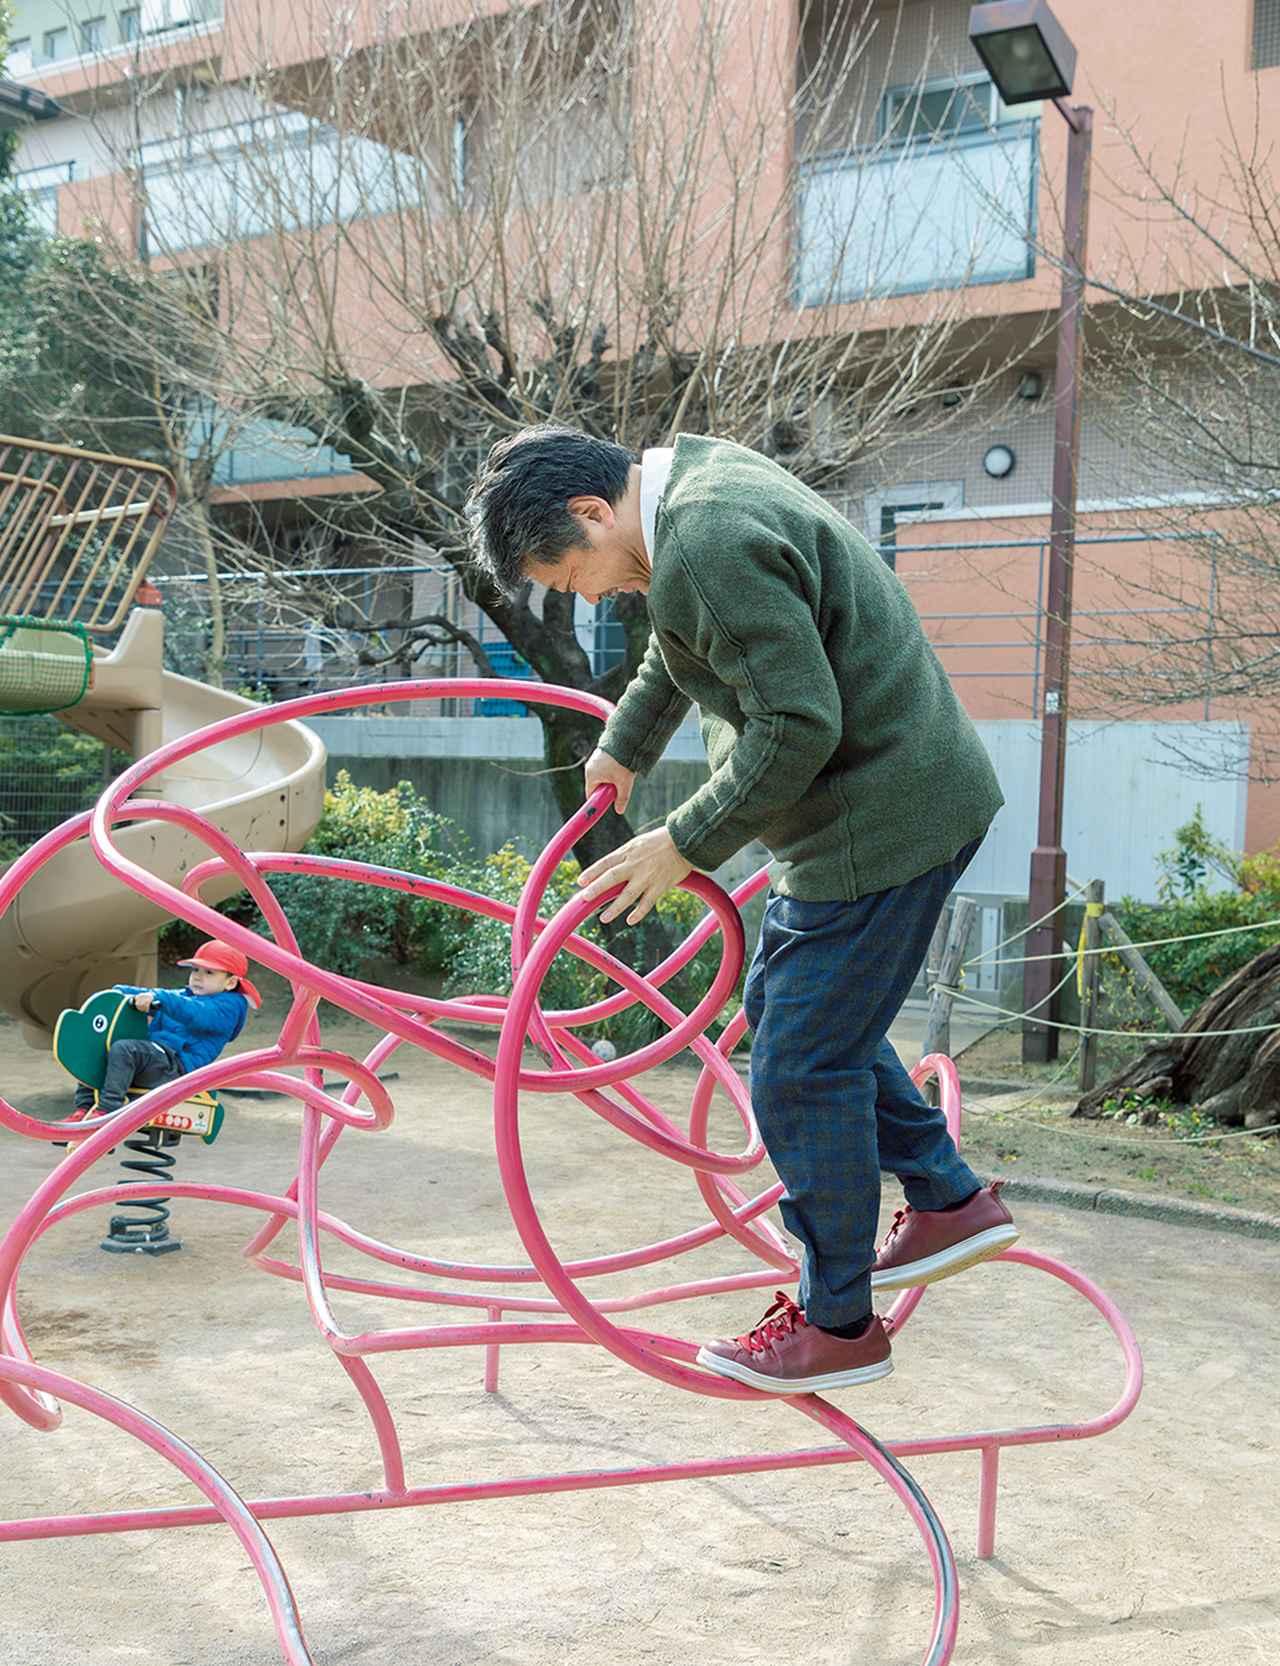 Images : 10番目の画像 - 「見えざる人々を見る。 映画監督・是枝裕和インタビュー」のアルバム - T JAPAN:The New York Times Style Magazine 公式サイト